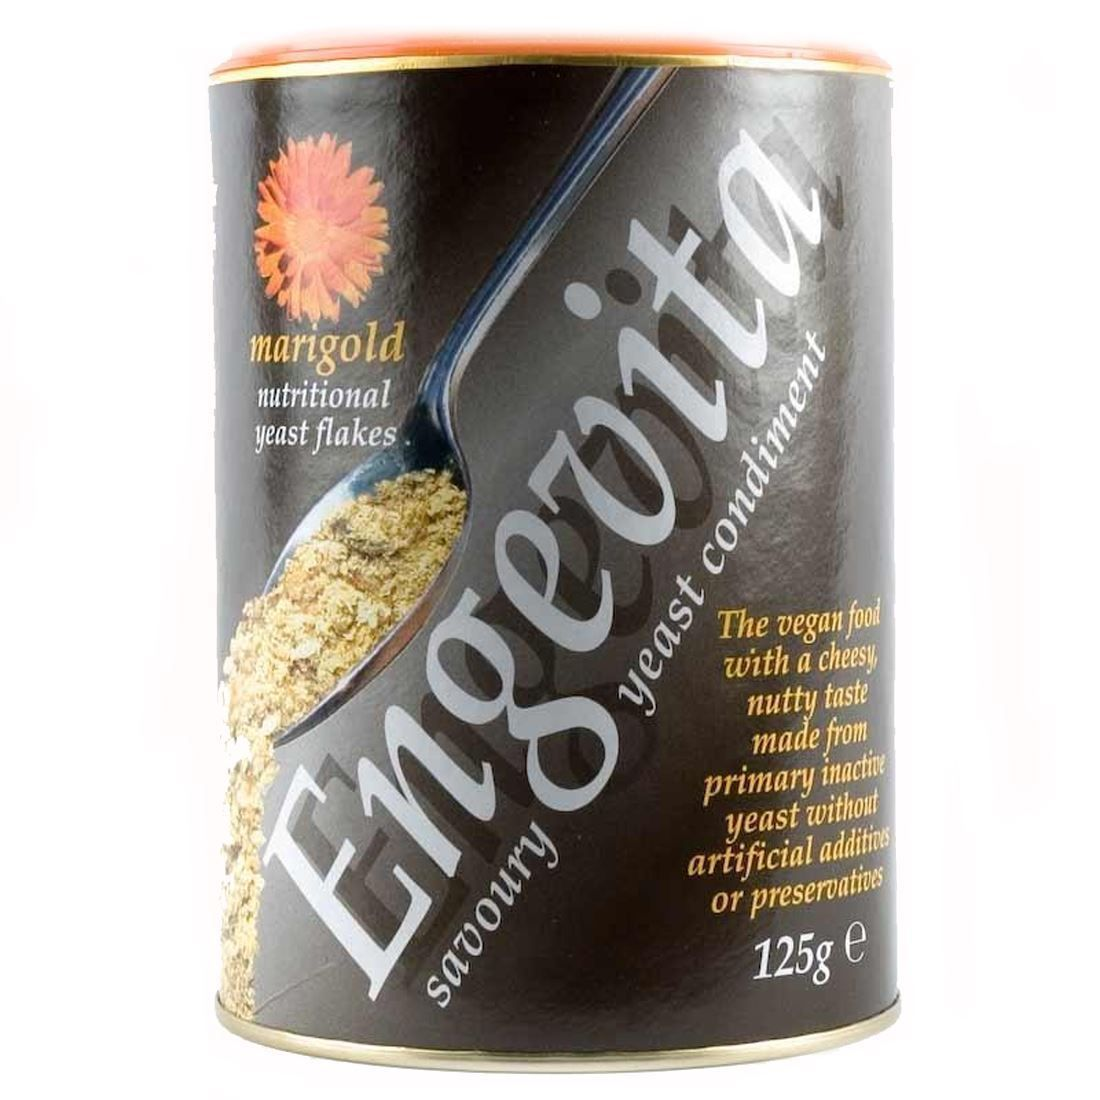 Engevita yeast flakes gluten free vegan friendly